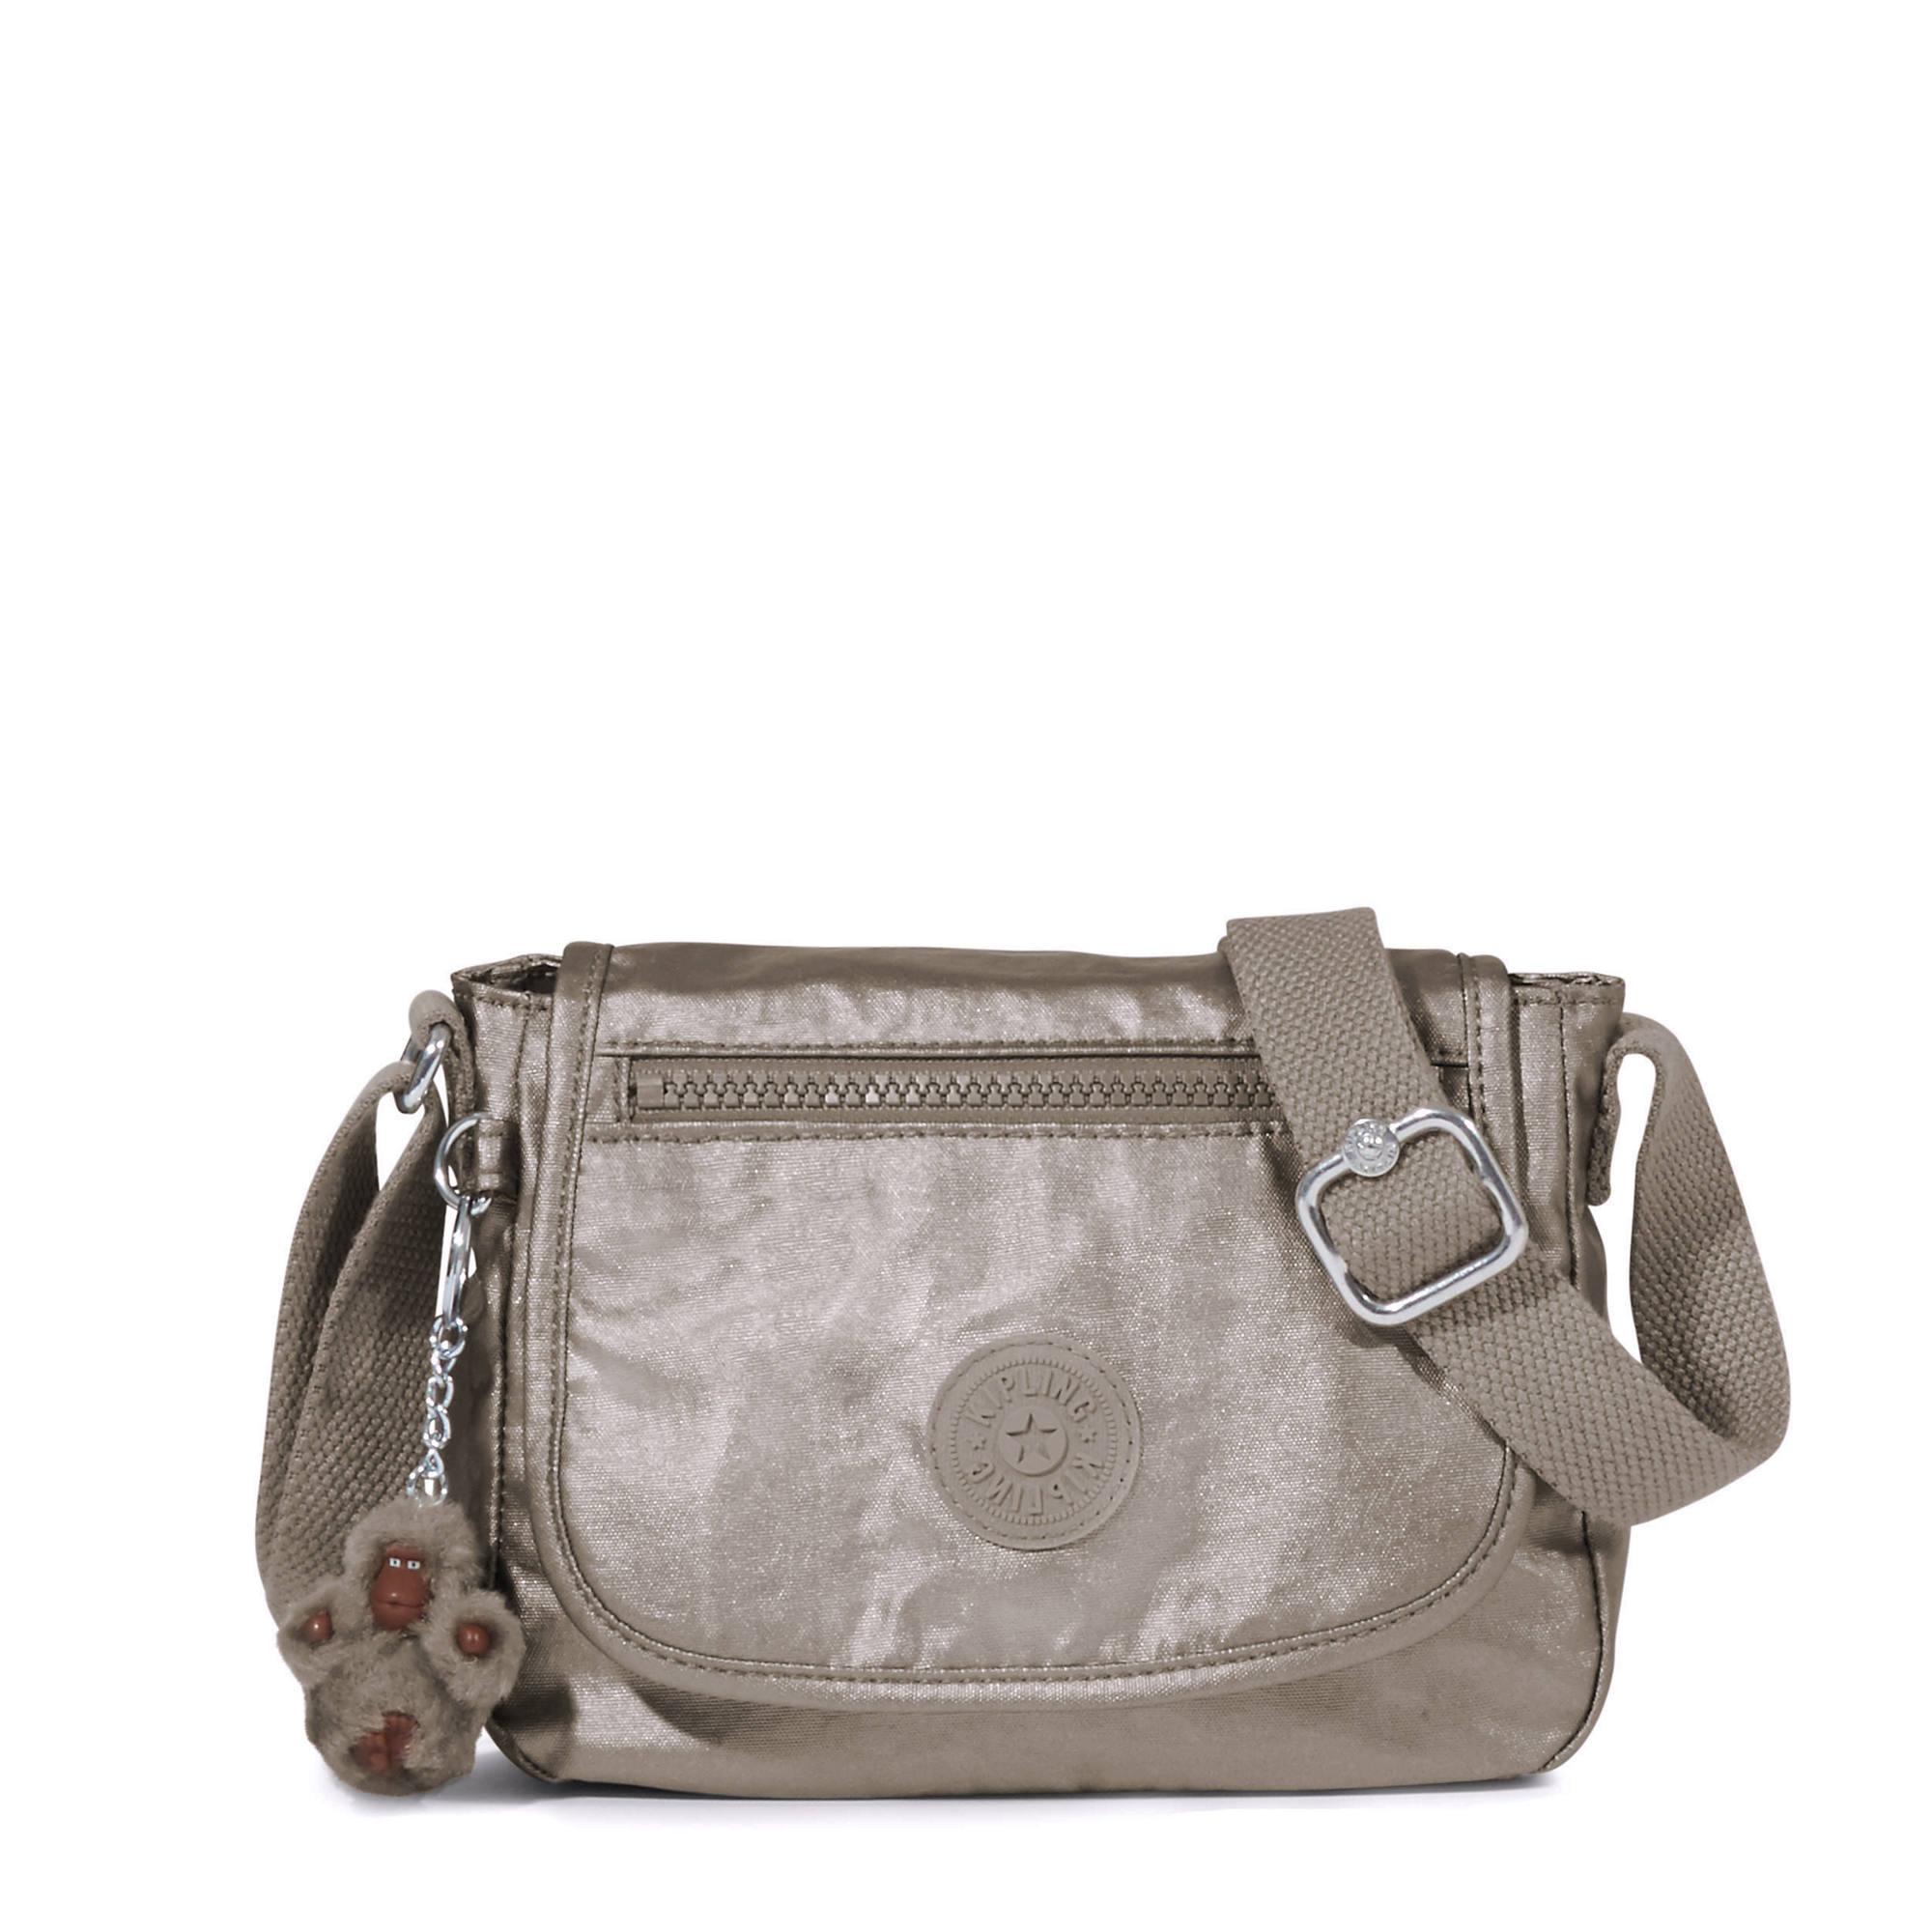 bd3ba9a4 Sabian Crossbody Metallic Mini Bag Kipling